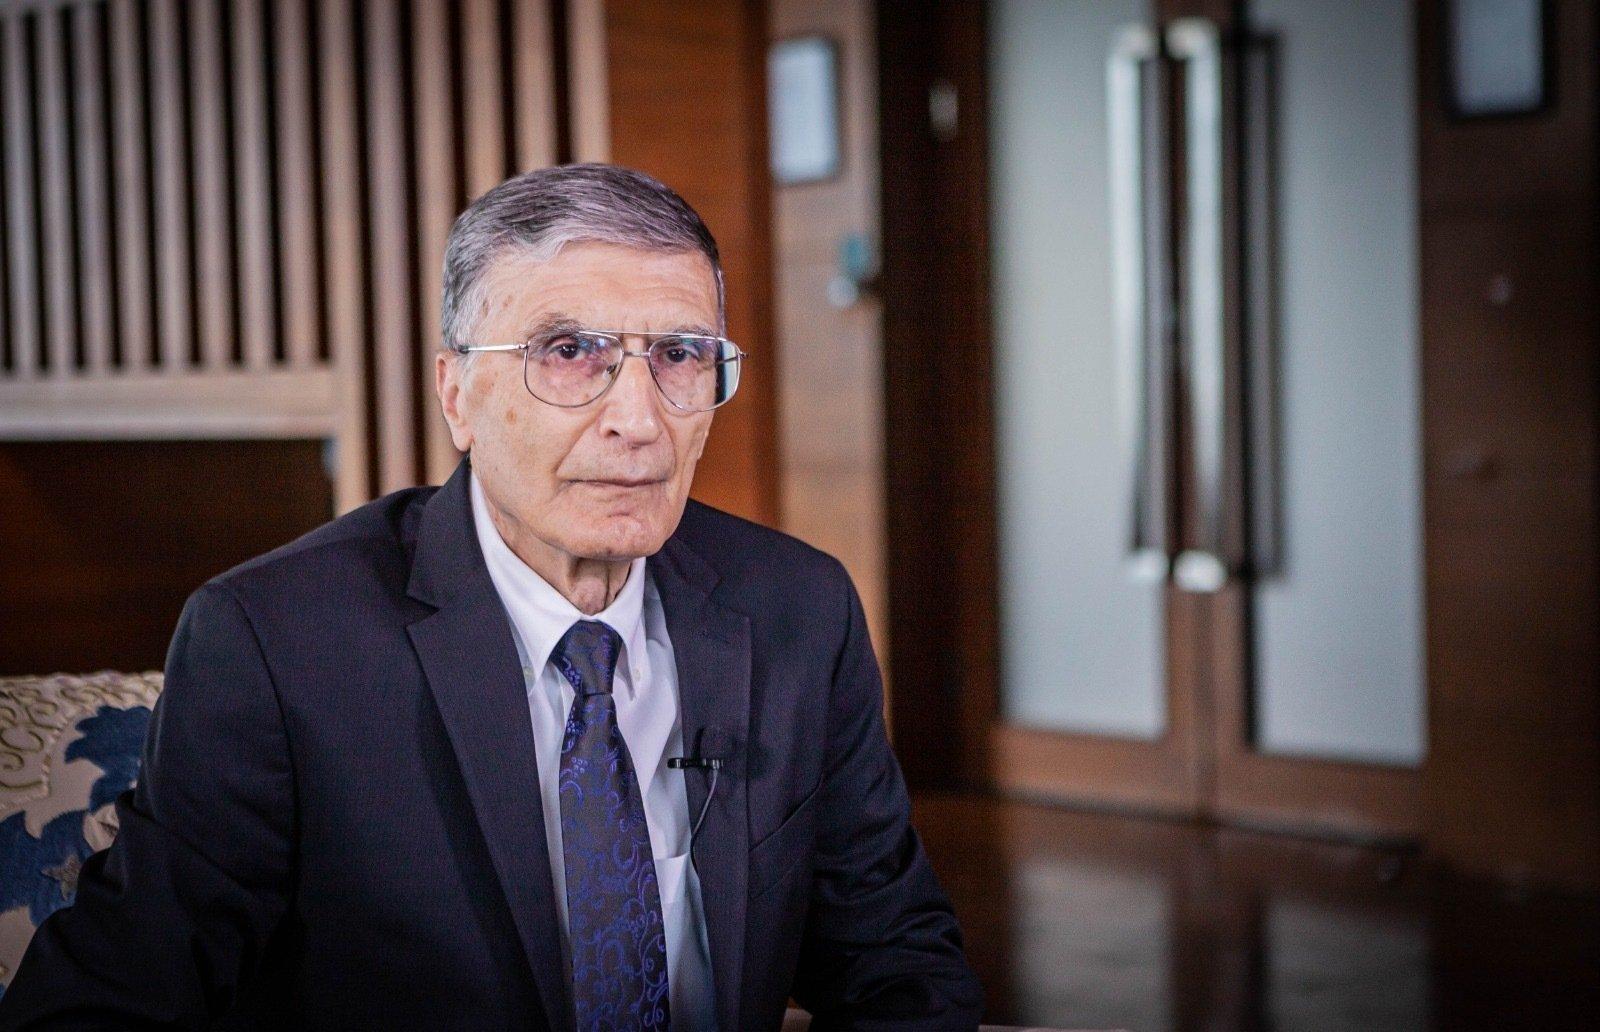 Turkey's Nobel laureate in chemistry Aziz Sancar speaks to Sabah in an interview, Istanbul, Turkey, Sept. 25, 2021. (Photo by Hatice Çınar)